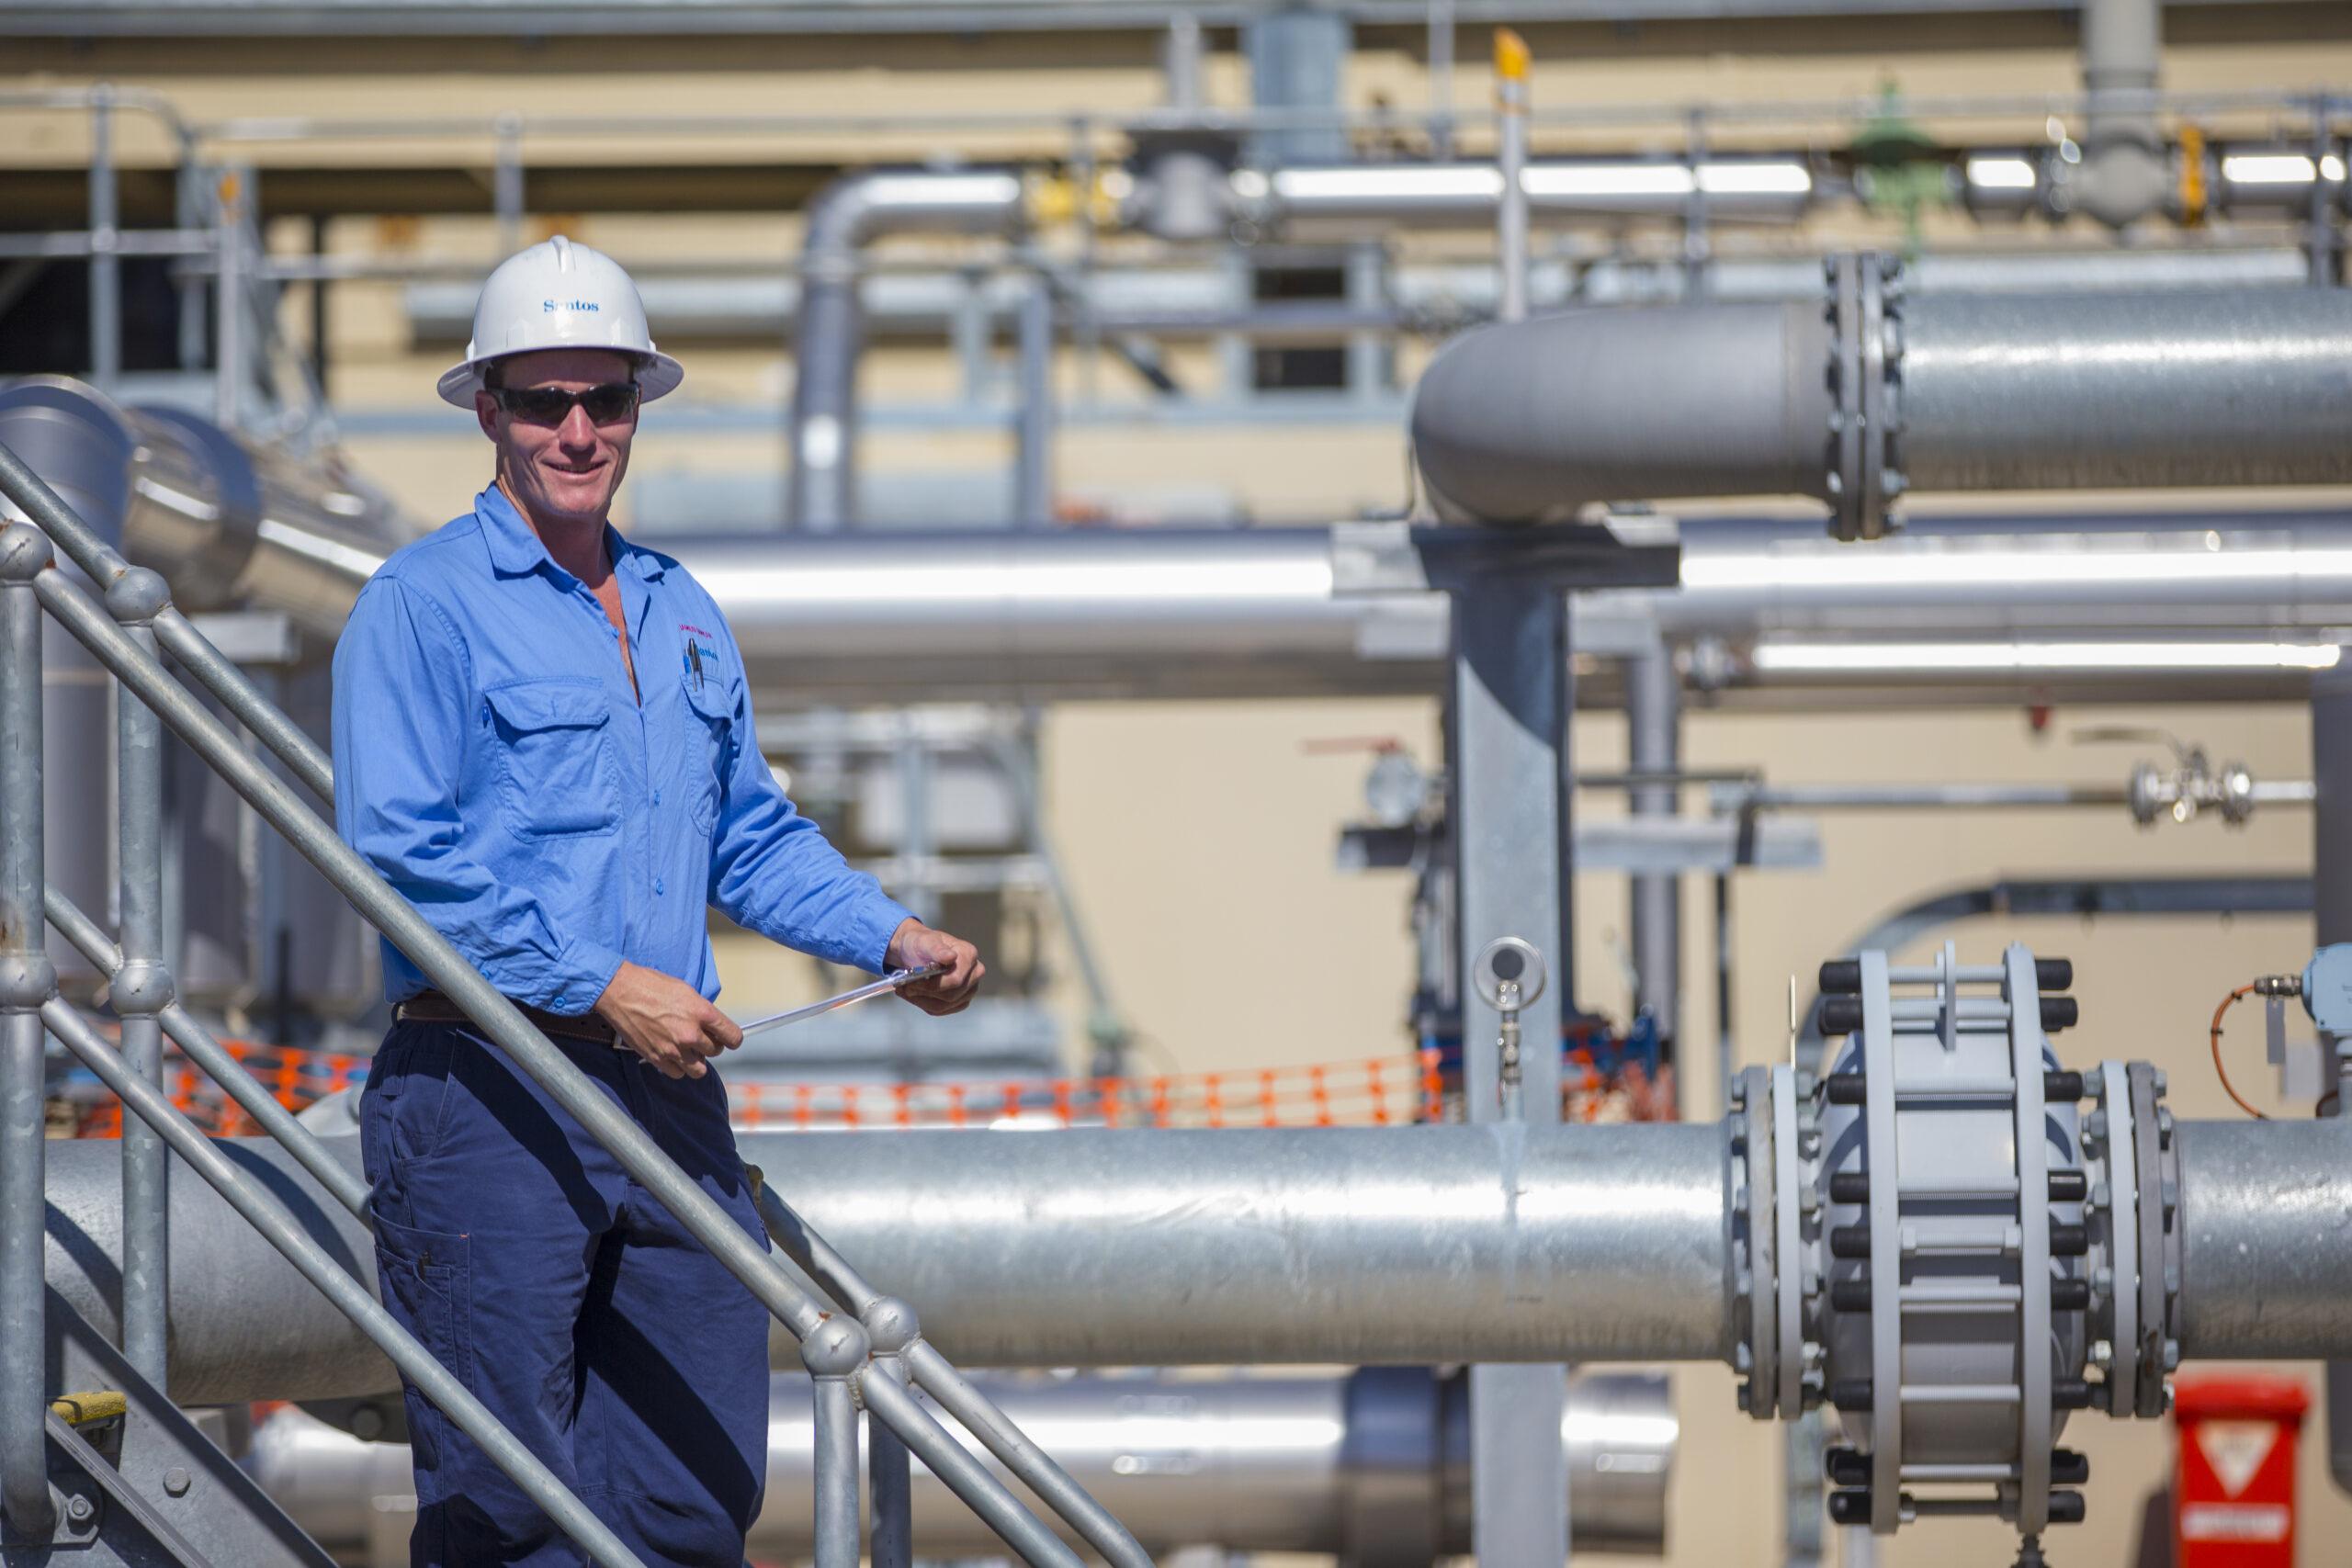 Govt confirms key role of Narrabri gas project